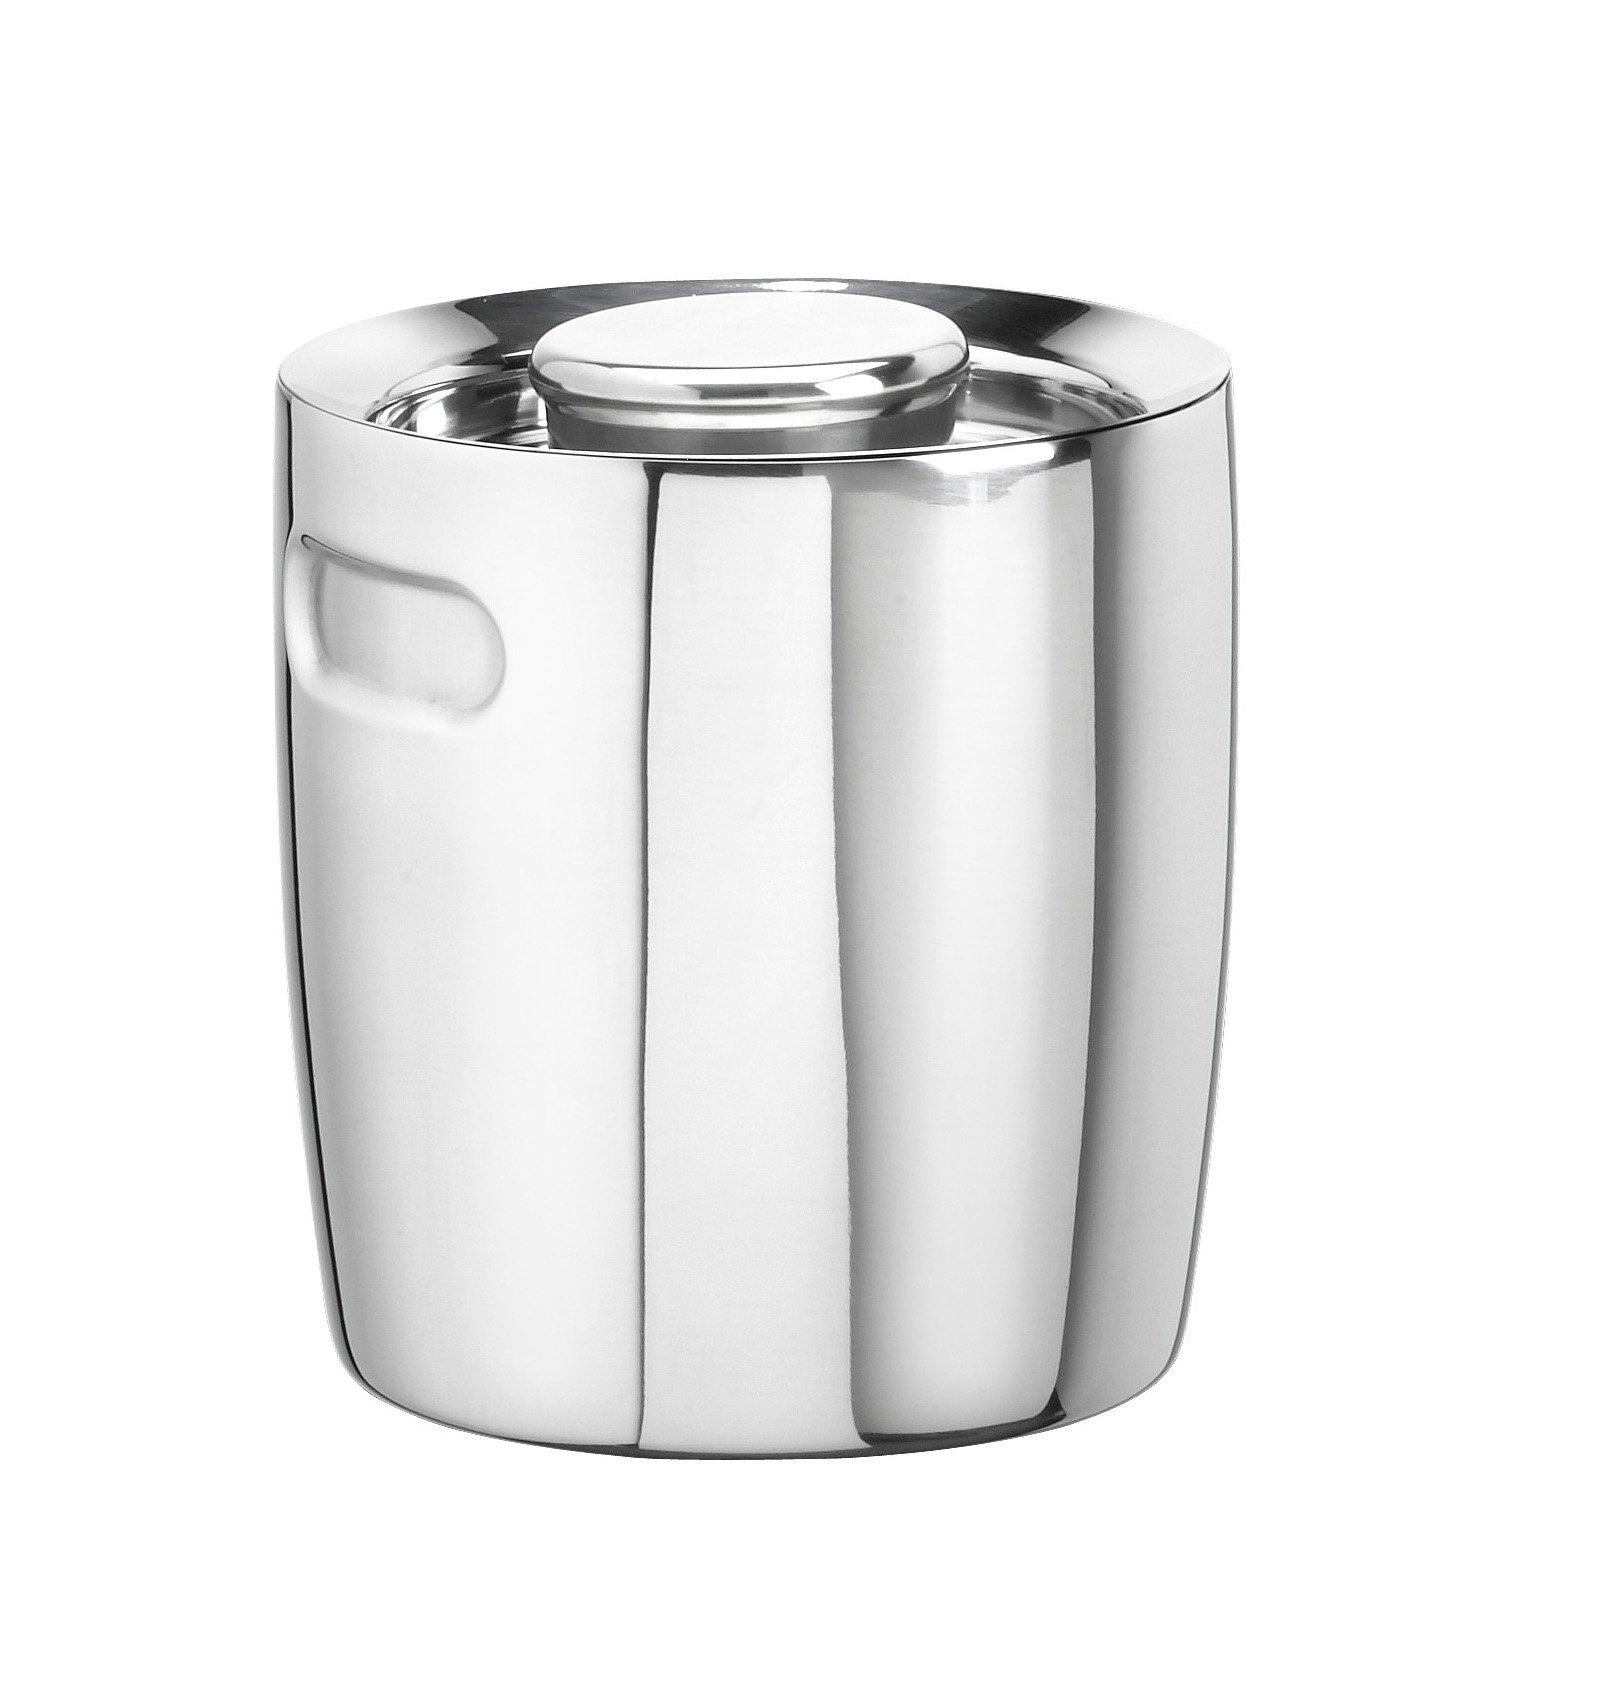 Kraftware Metals & Stainless Steel Ice Bucket, 1.5 Quart, Silver